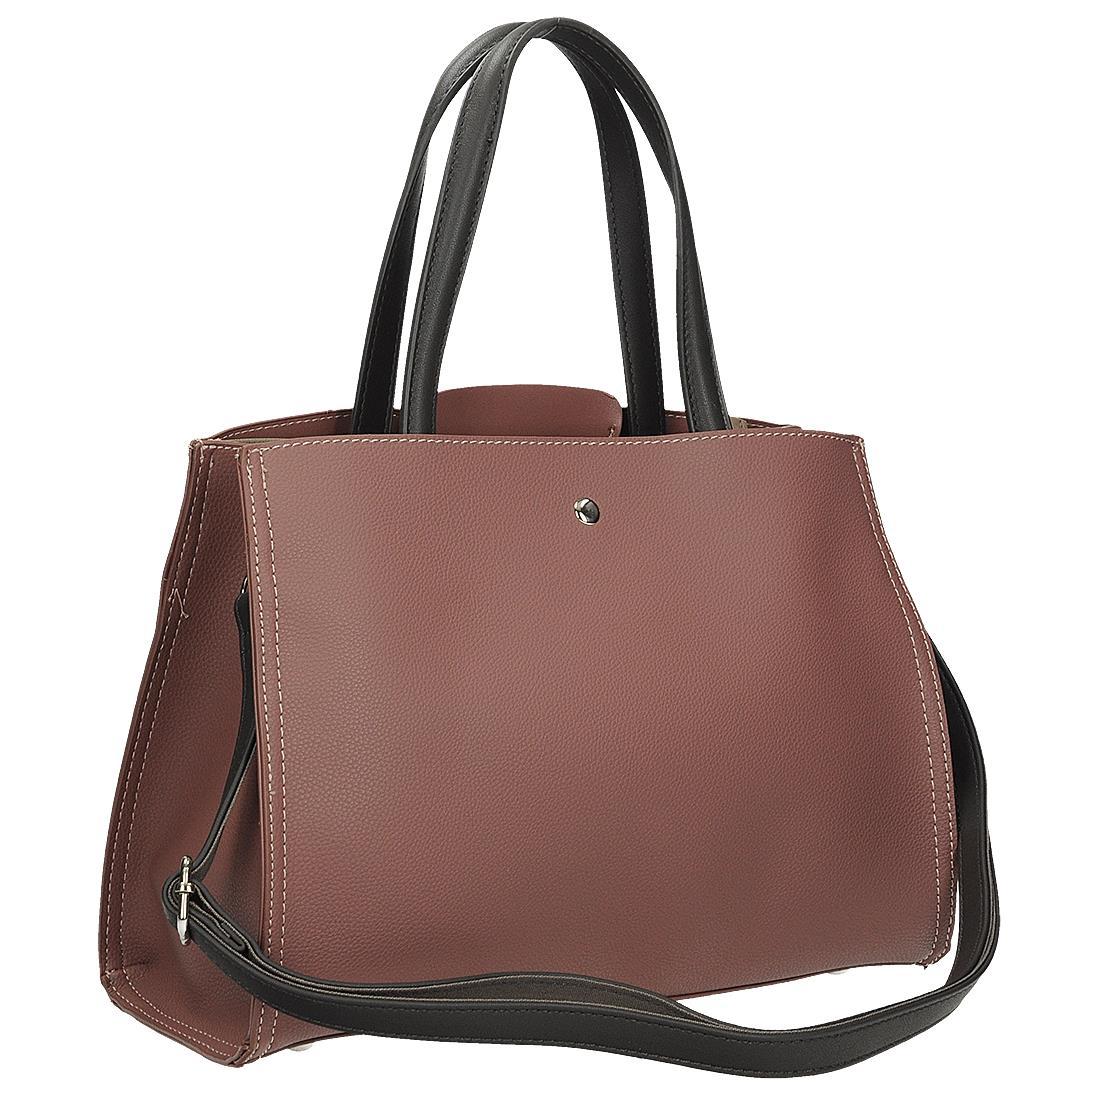 7f74b73a9ae56 Torebka damska kuferek w kolorze różowym DAVID JONES 5853-2 ...